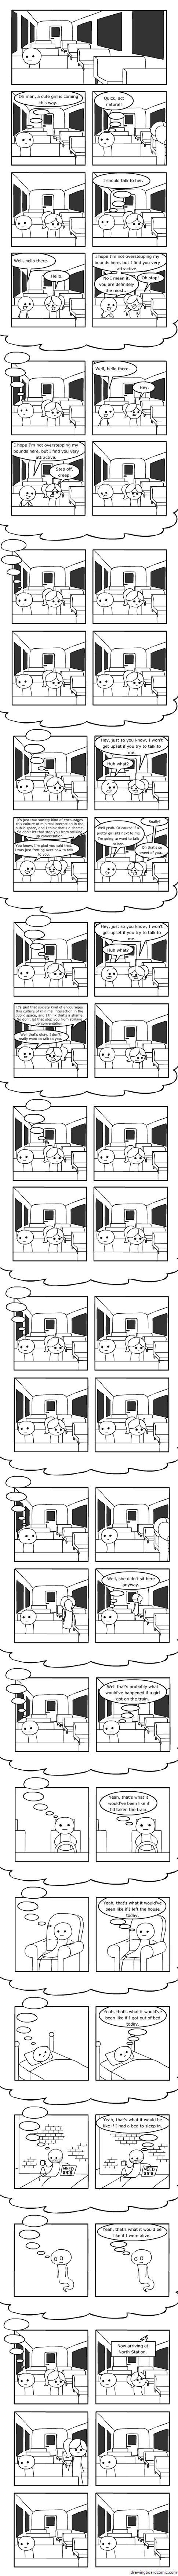 Comics that say something. - Quora